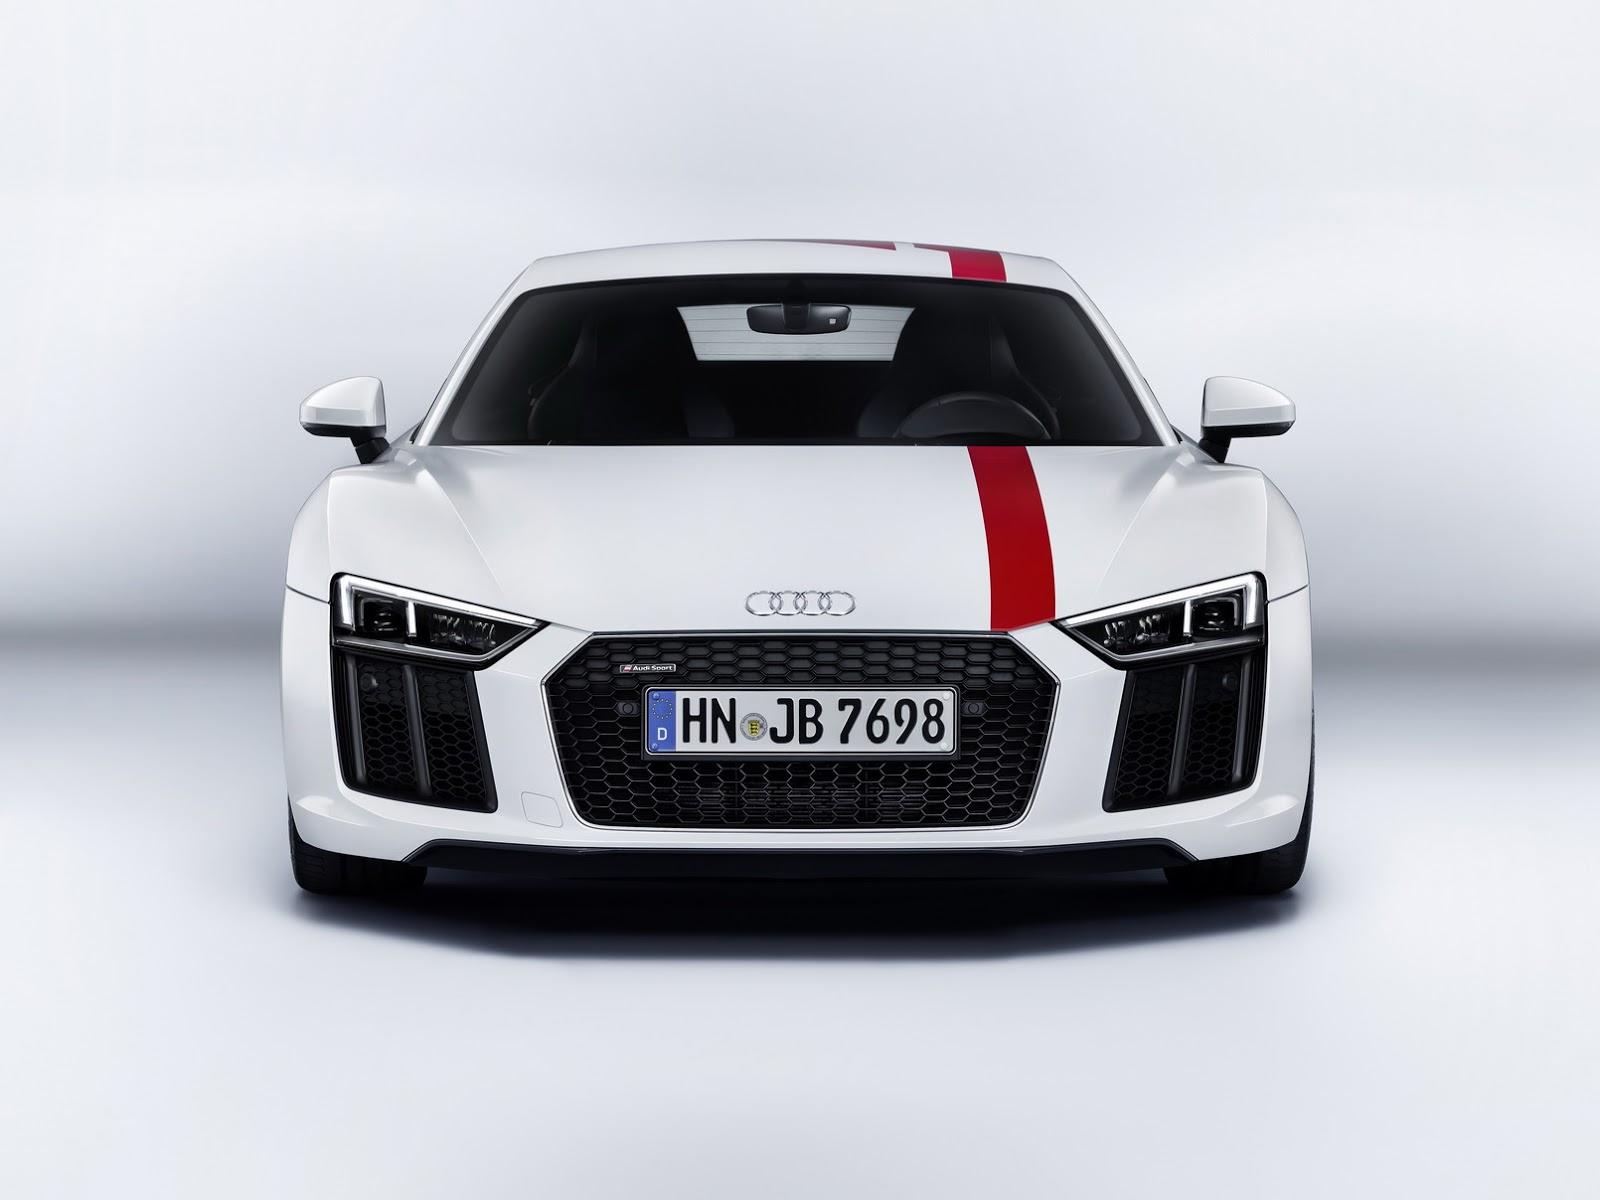 2018_Audi_R8_V10_RWS_59